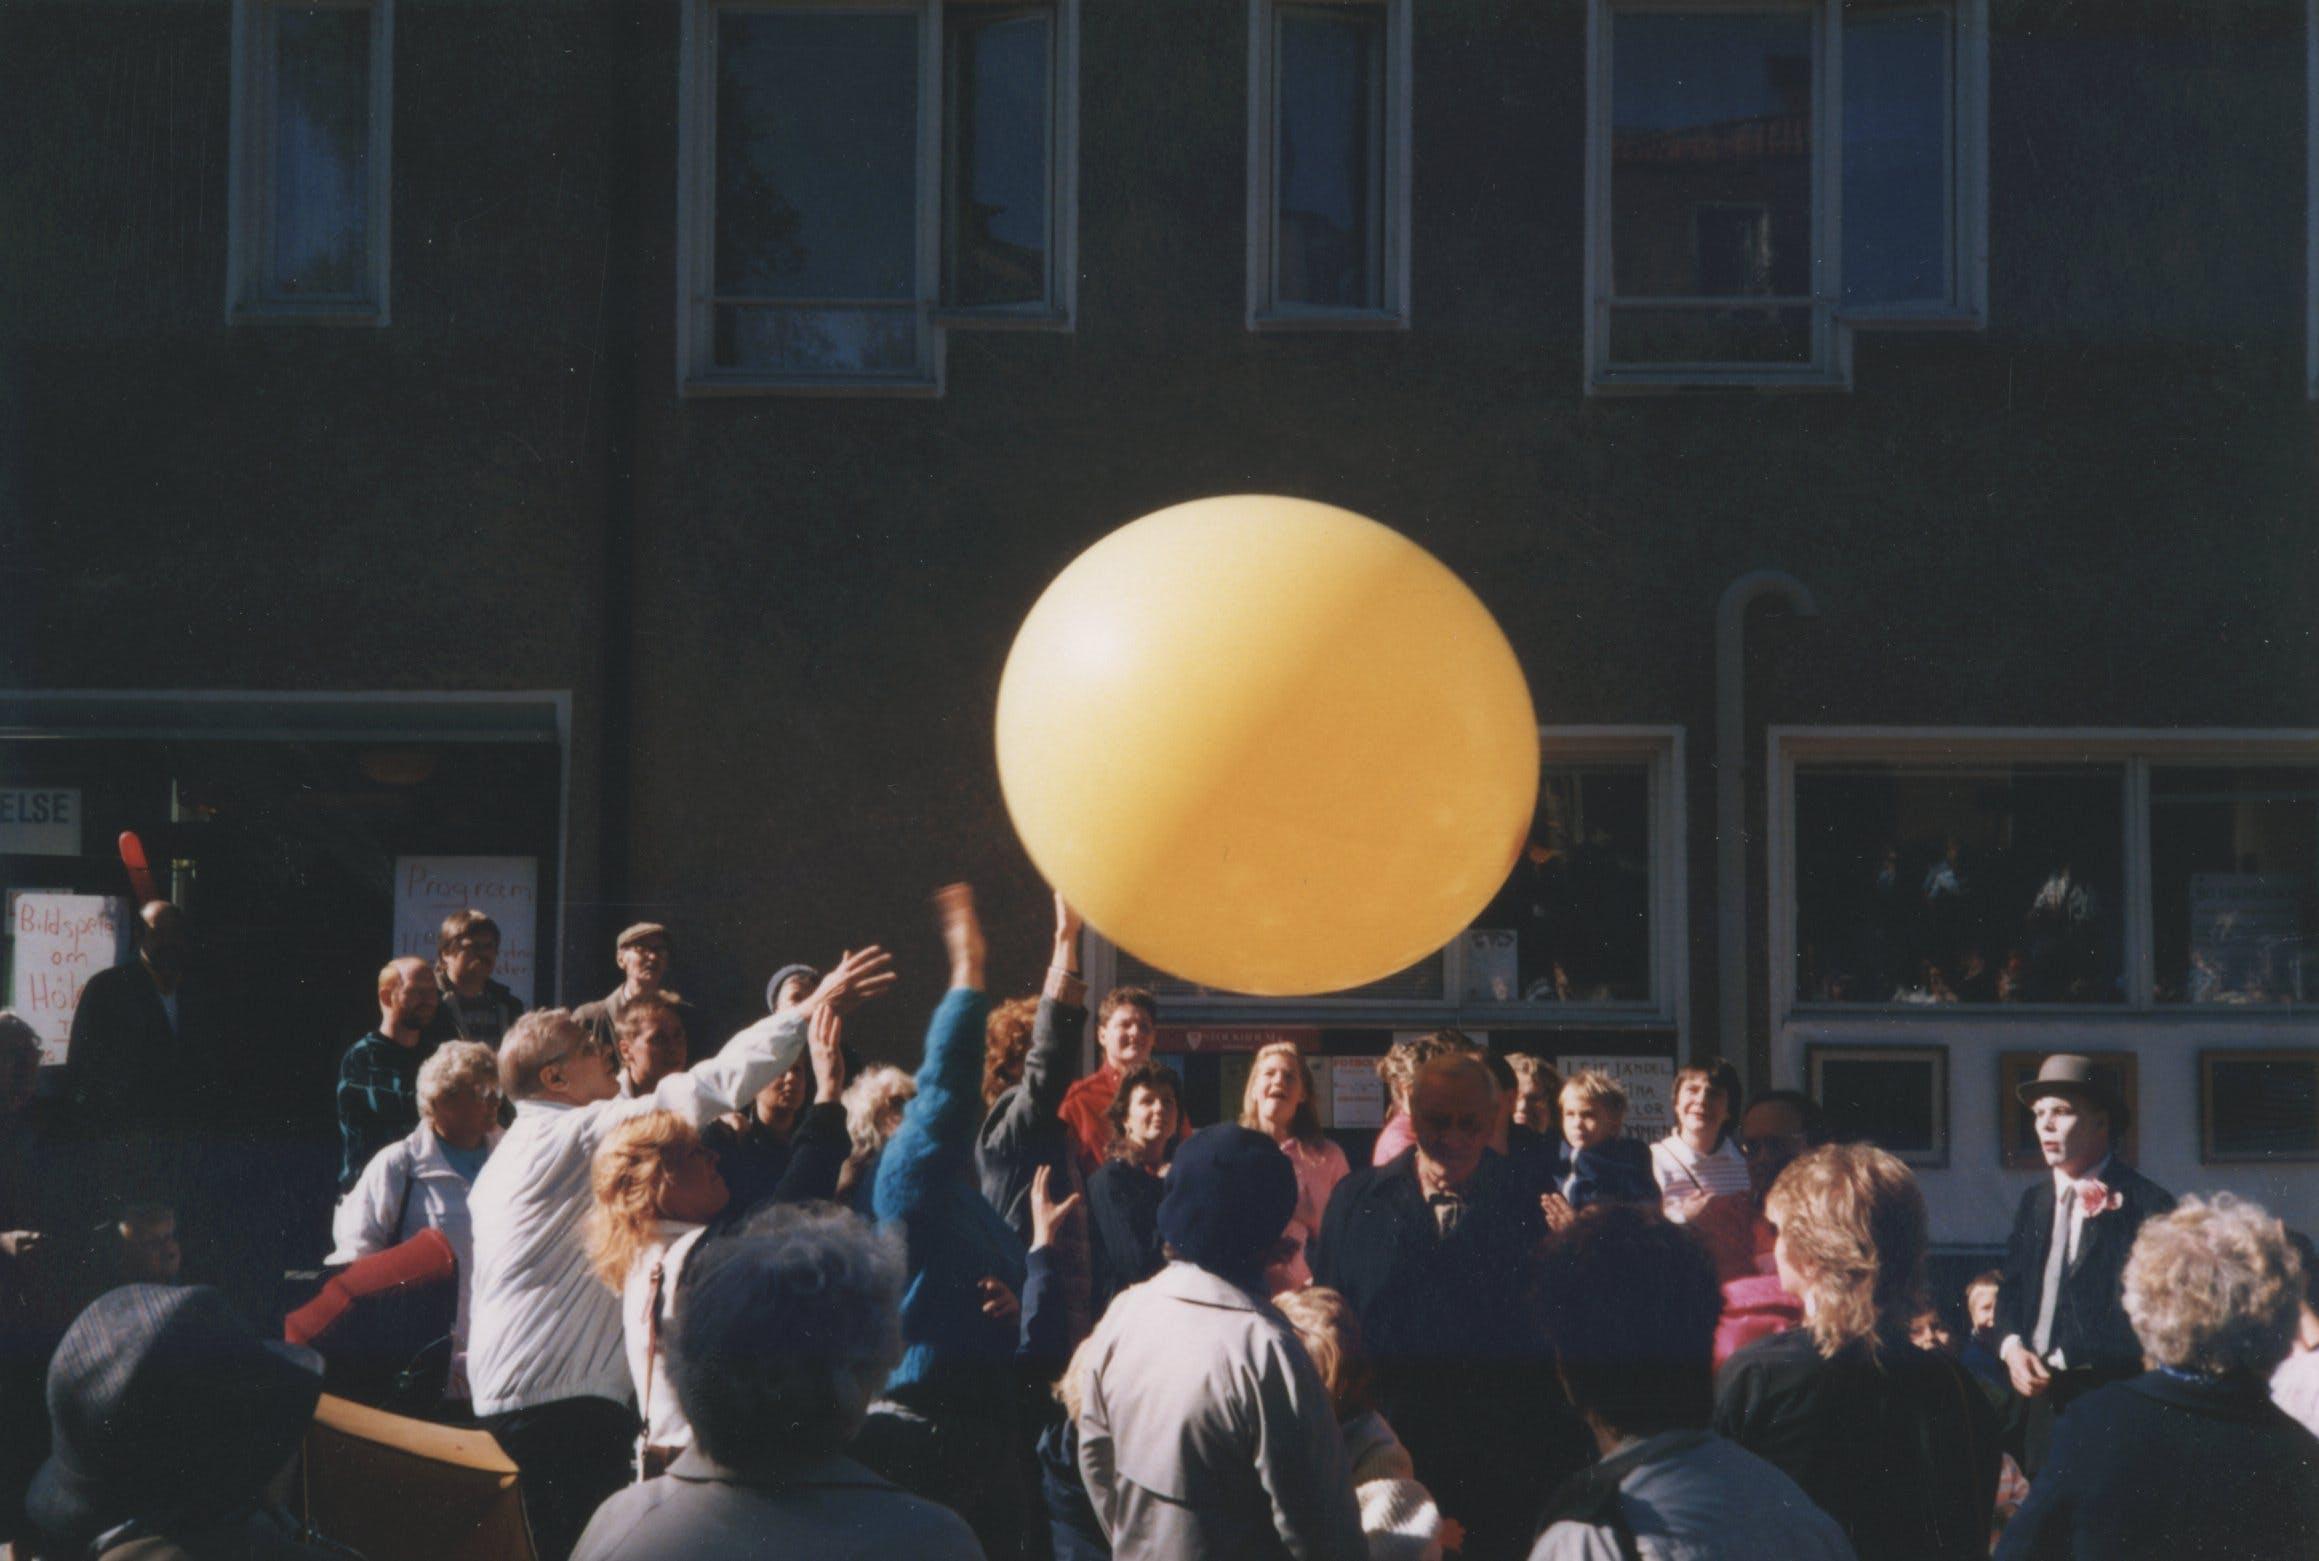 Hökarängens dag (city festival) 1986. Photographer unknown.